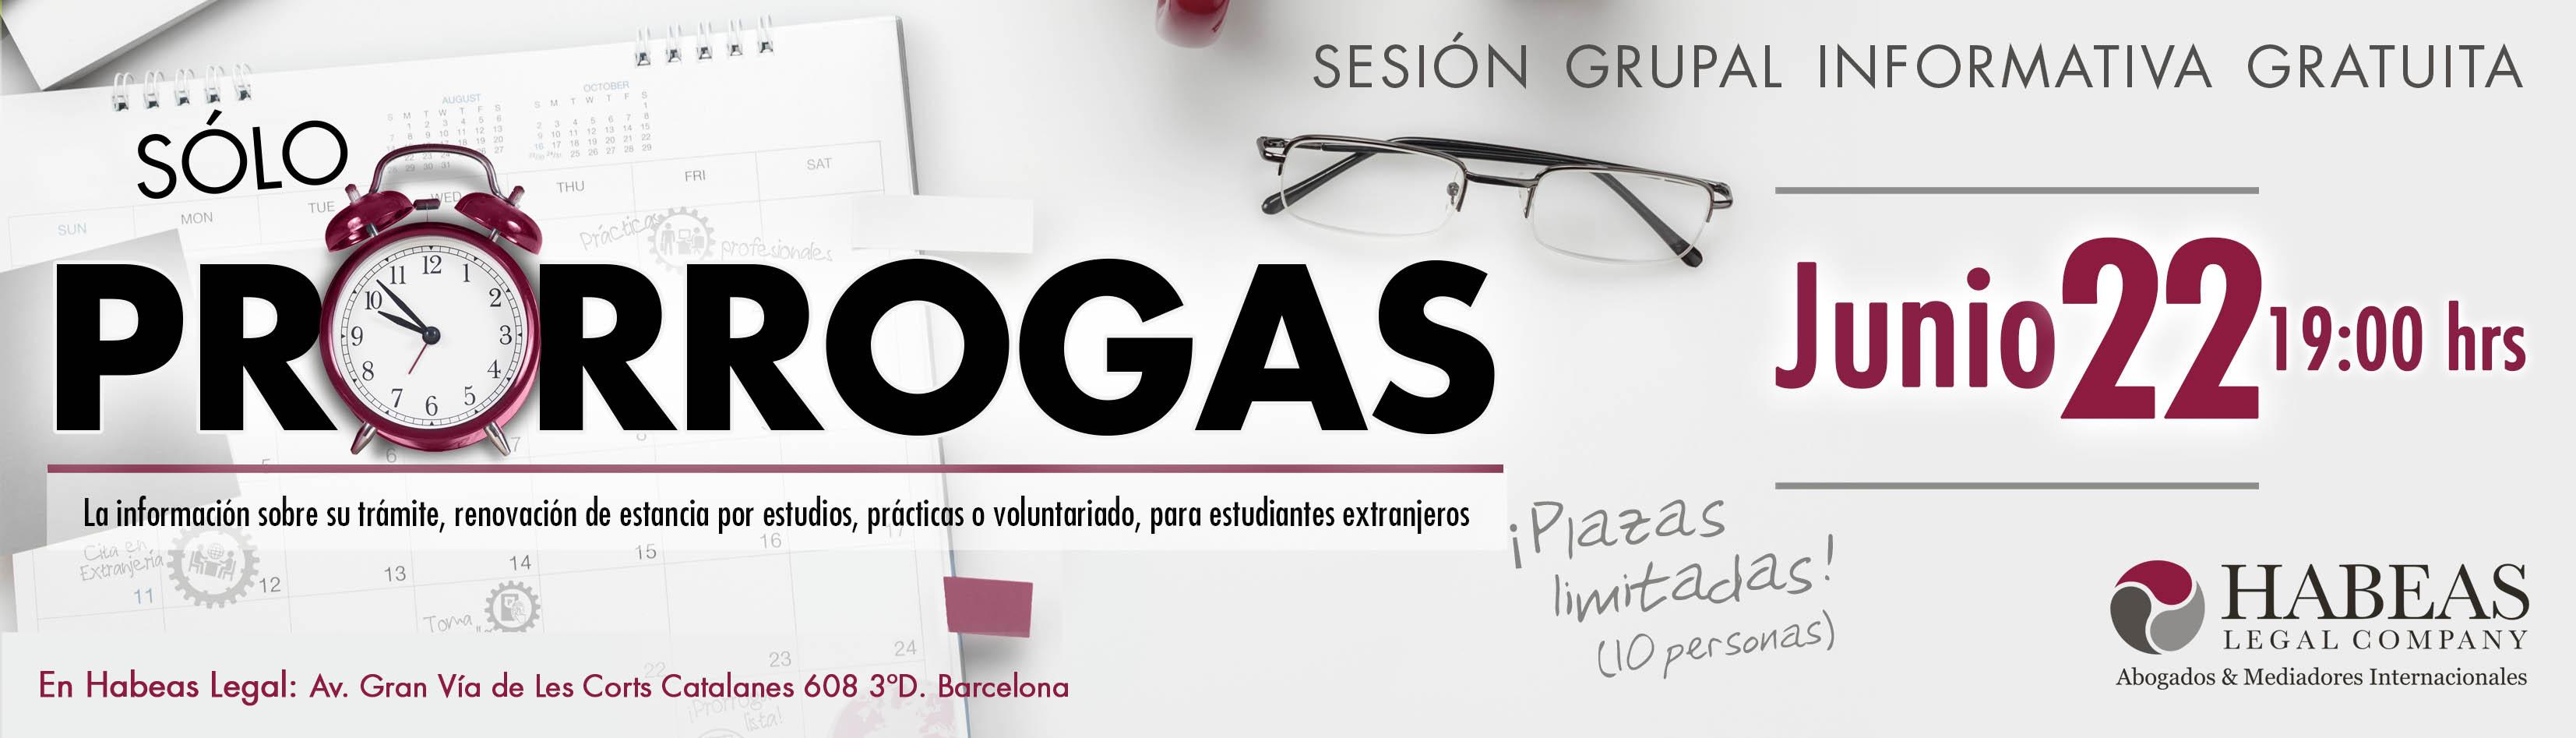 "SlidePrórrogas Jun22 - Inscripción evento ""Sólo Prórrogas"", Junio 22, 2018"